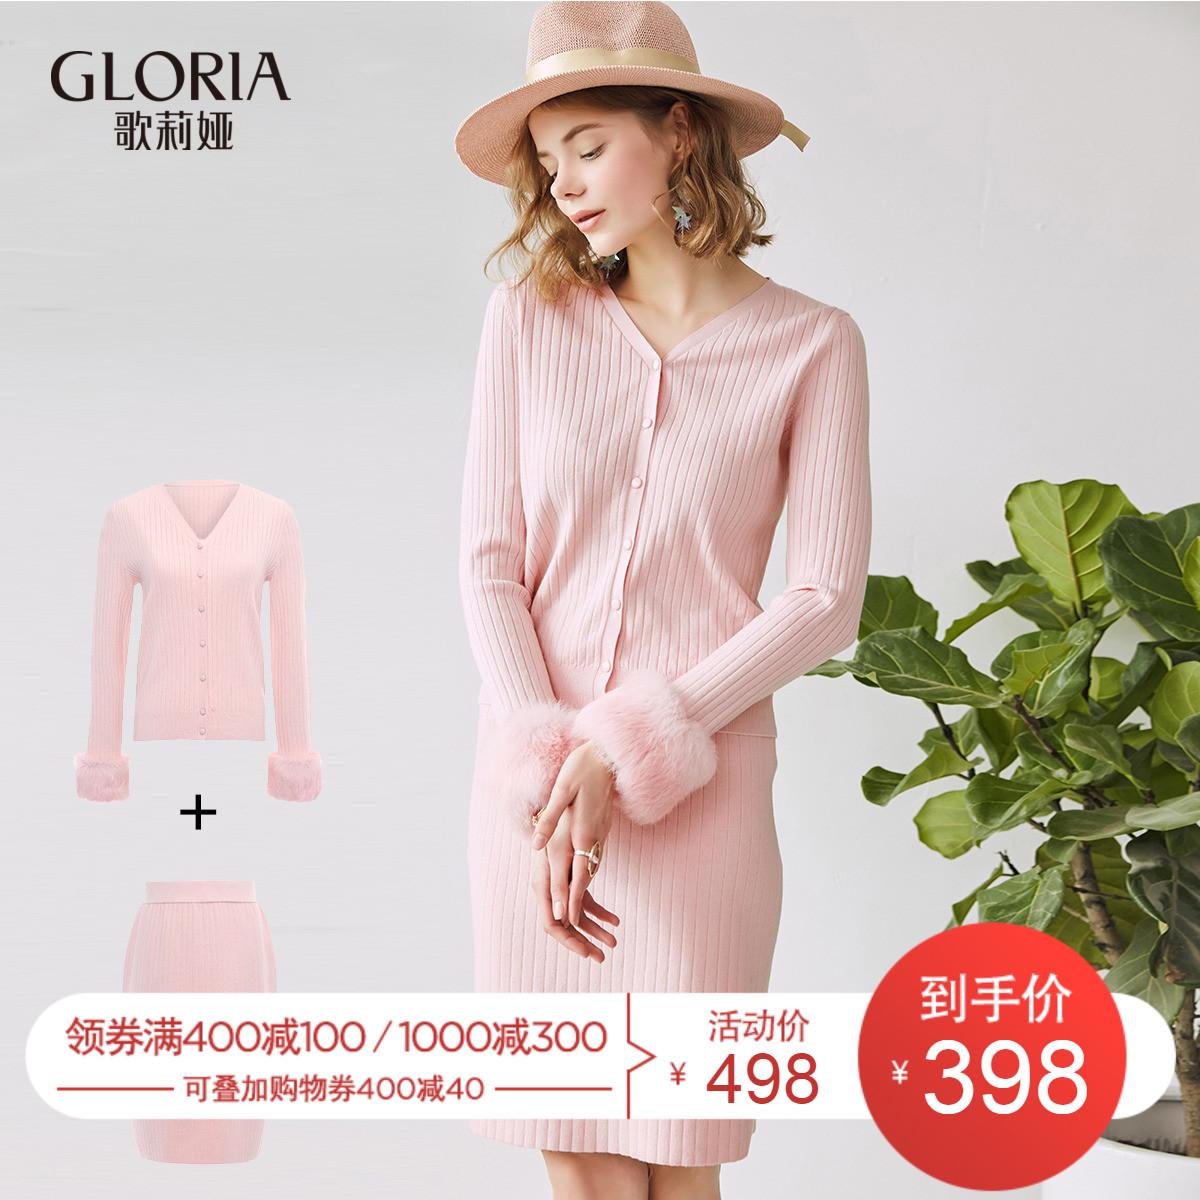 GLORIA-歌莉娅女装2018秋款可拆卸袖口两件套装毛织裙181K5K140